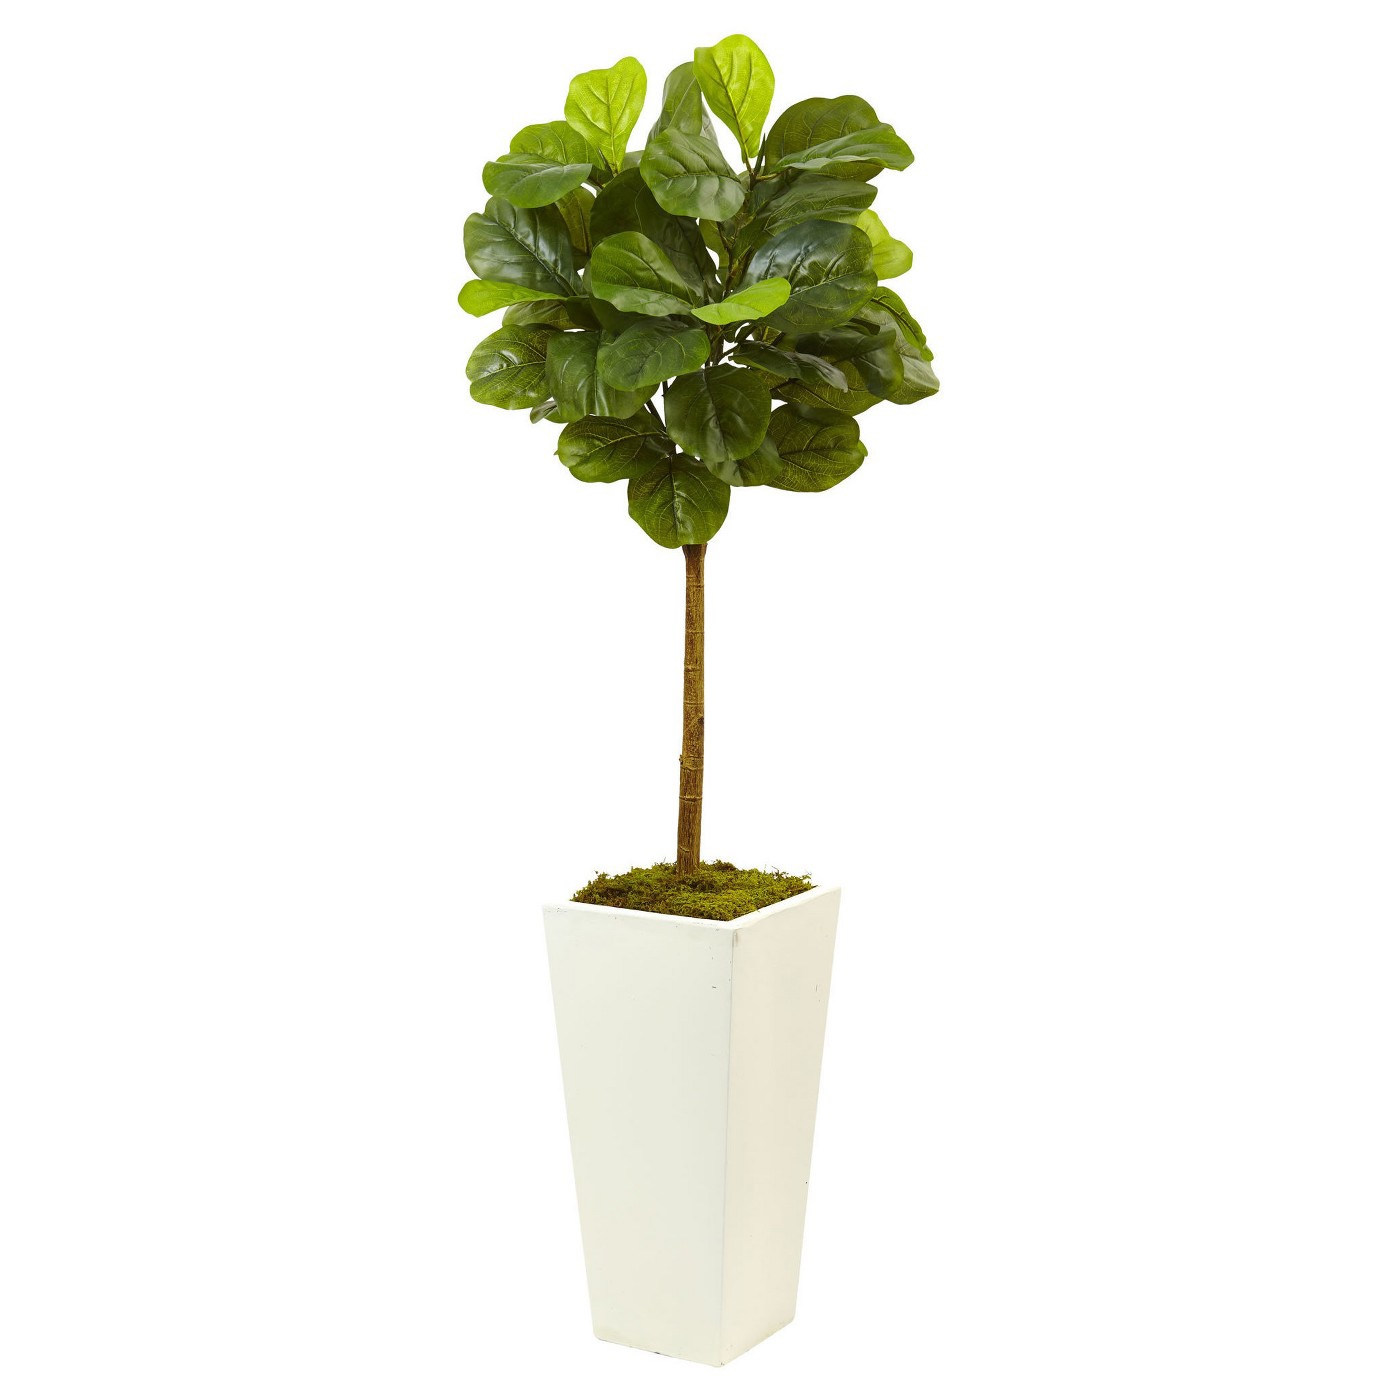 4.5 ft fiddle leaf fig tree with planter.jpg